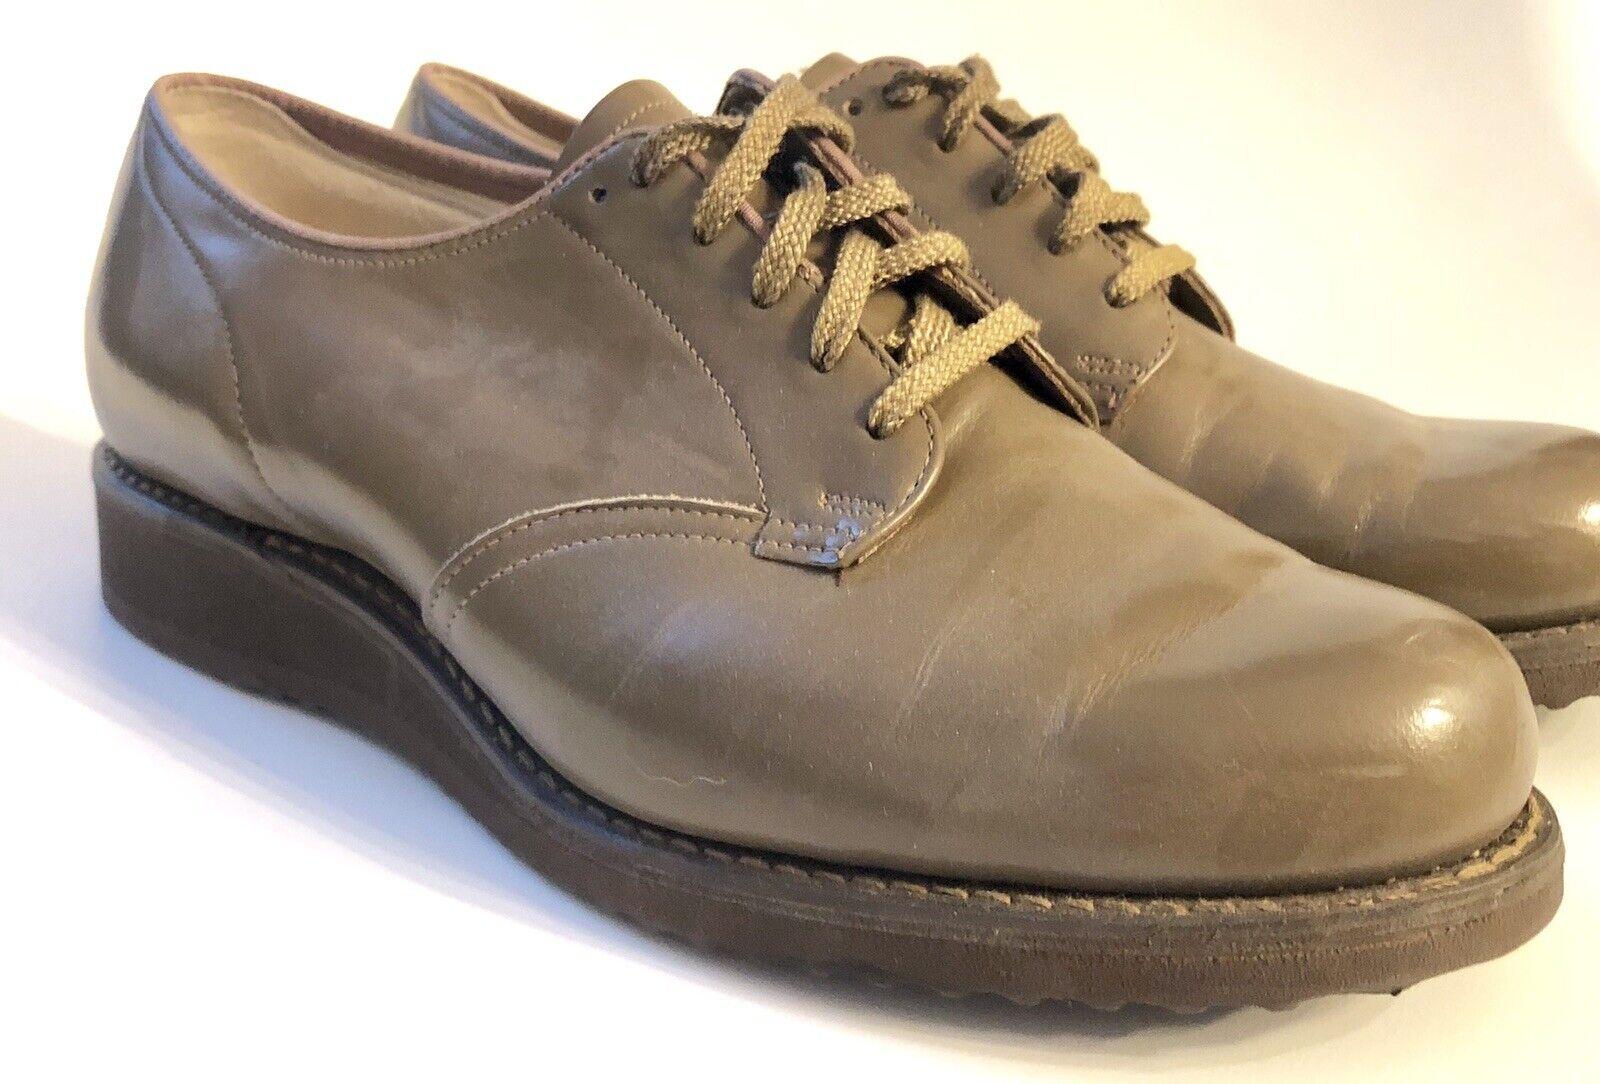 Vintage Mid Century Dr Scholl gående skor bspringaaa läder Storlek 6 C Lace Up Wedge